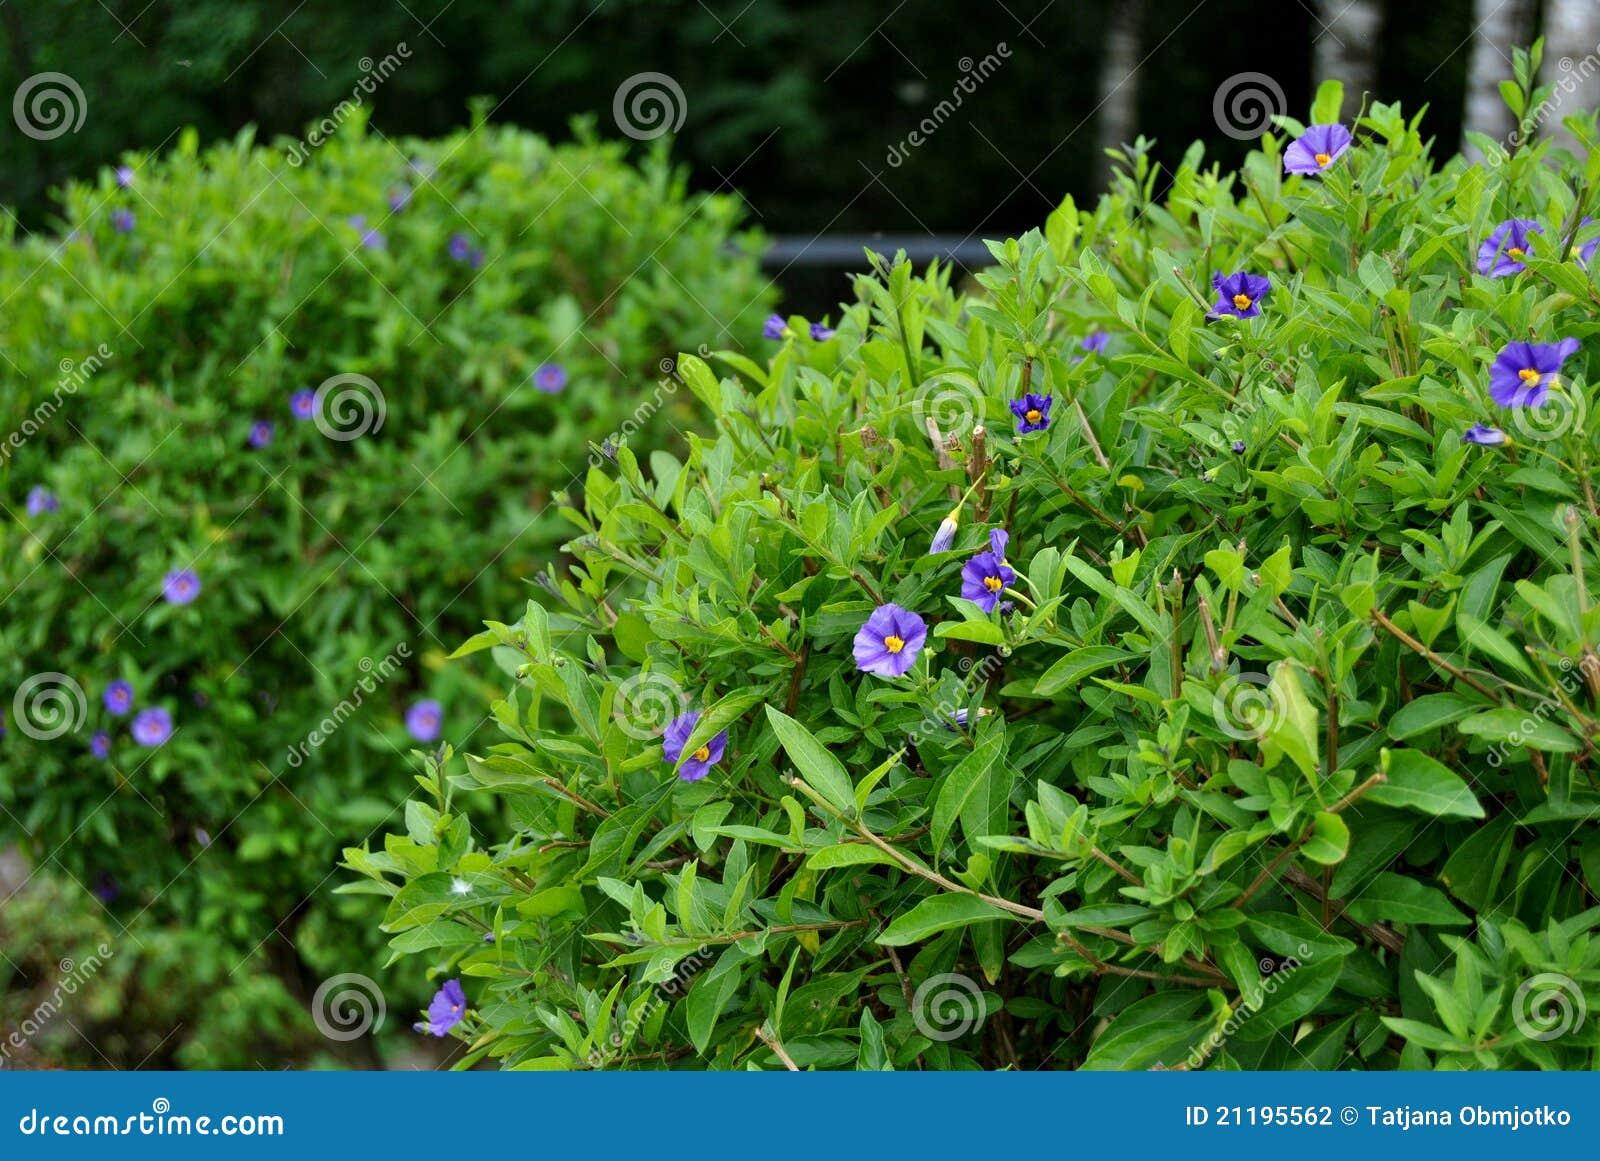 Green Bush Stock Photo Image Of City Tree Leaf Flower